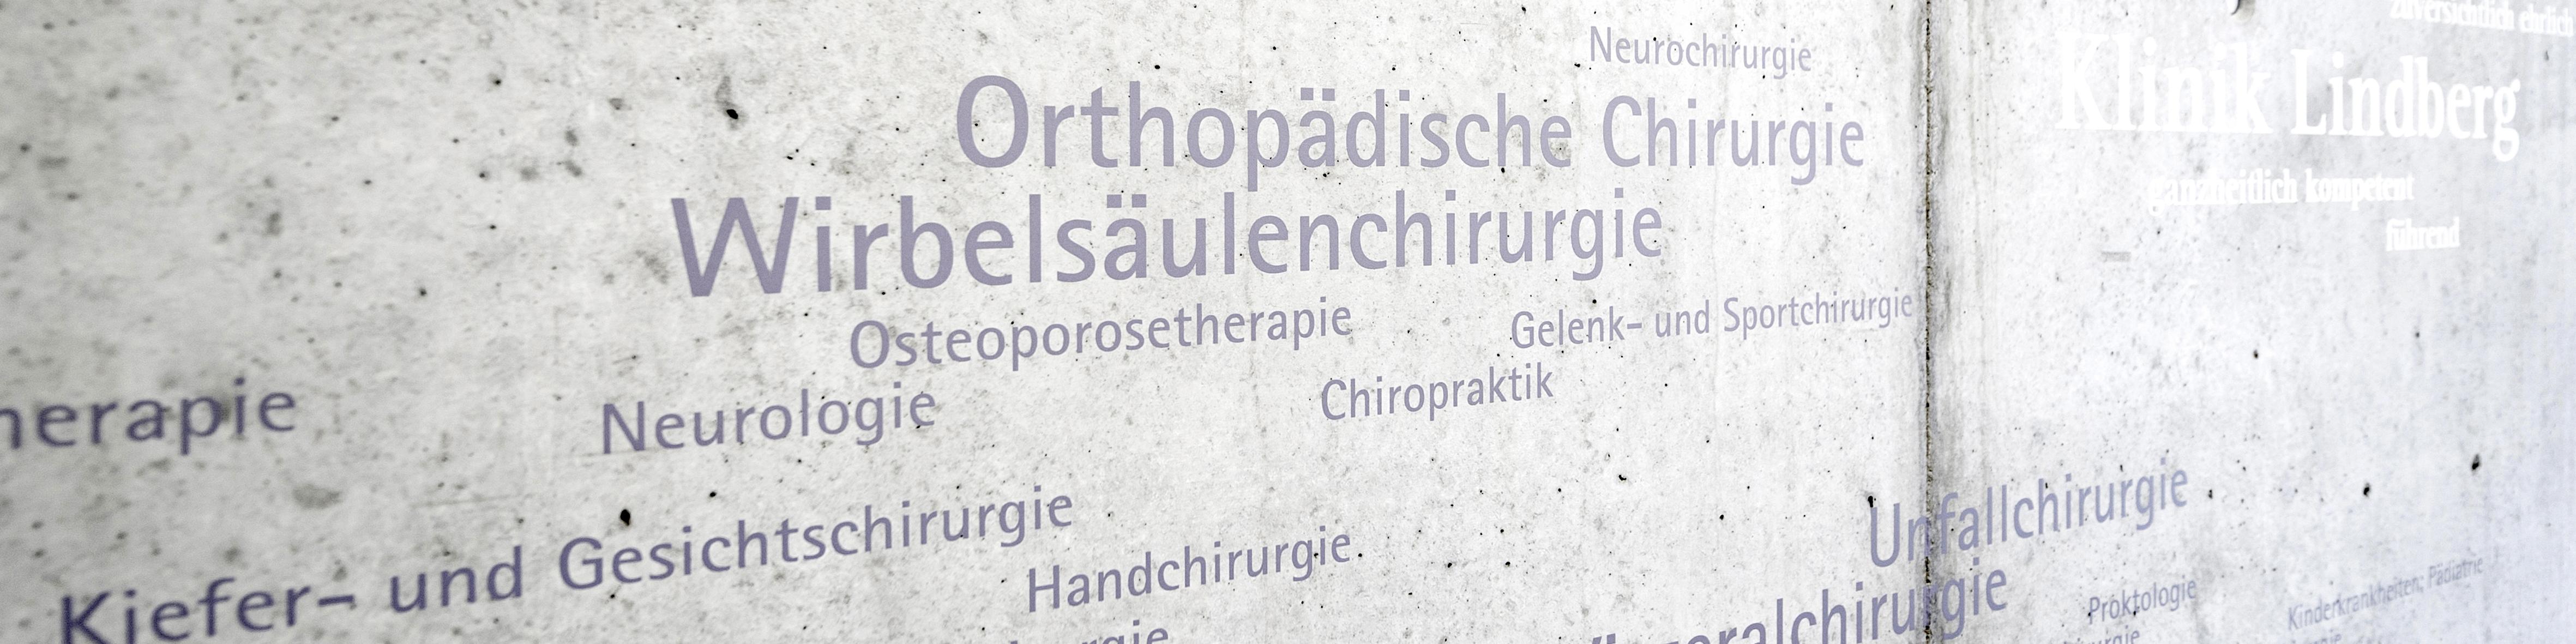 Orthopädie, Traumatologie und Sportmedizin